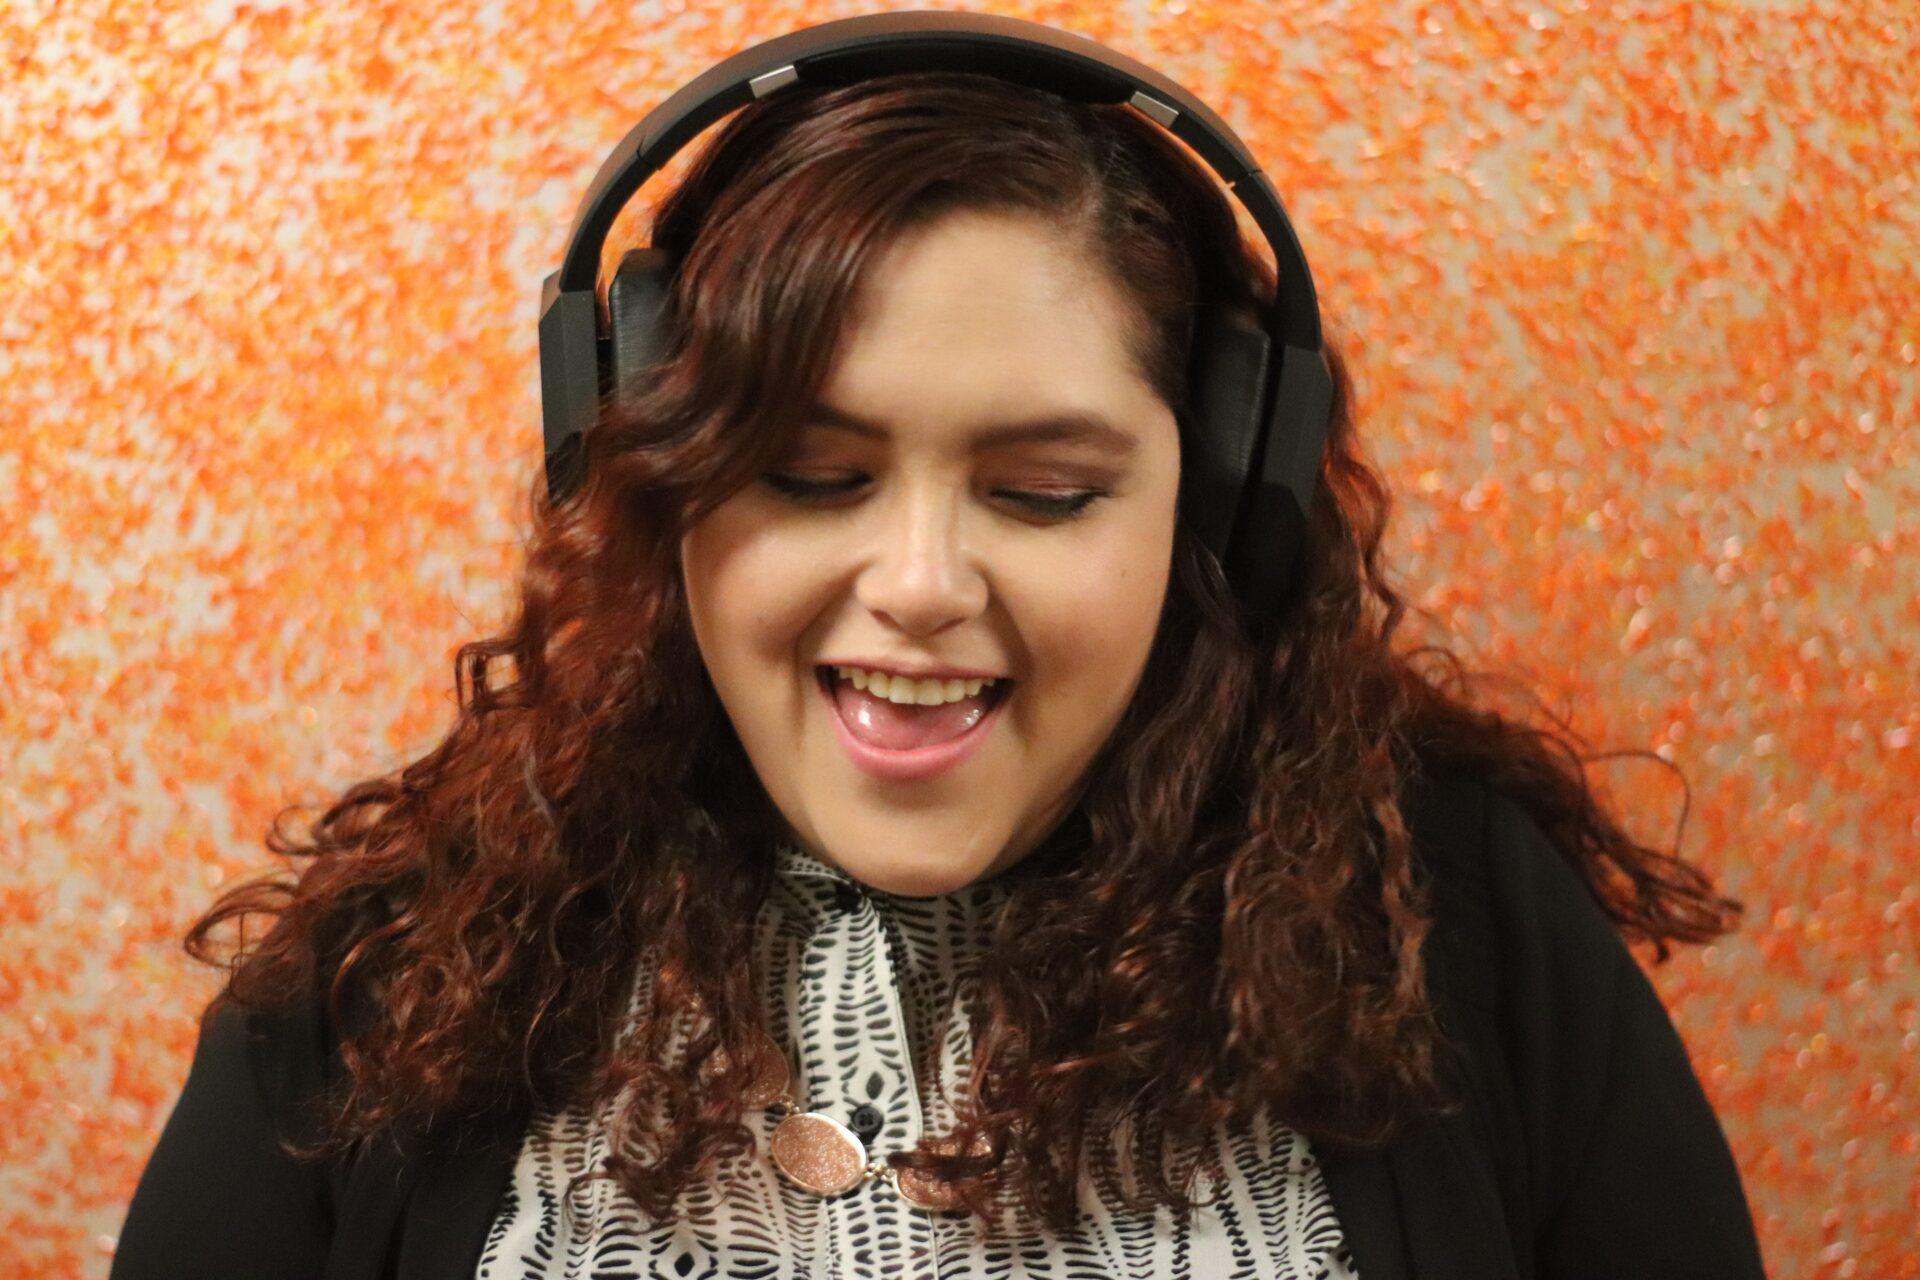 SALSA RADIO AMIGA ONLINE EN VIVO POR INTERNET GRATIS FREE